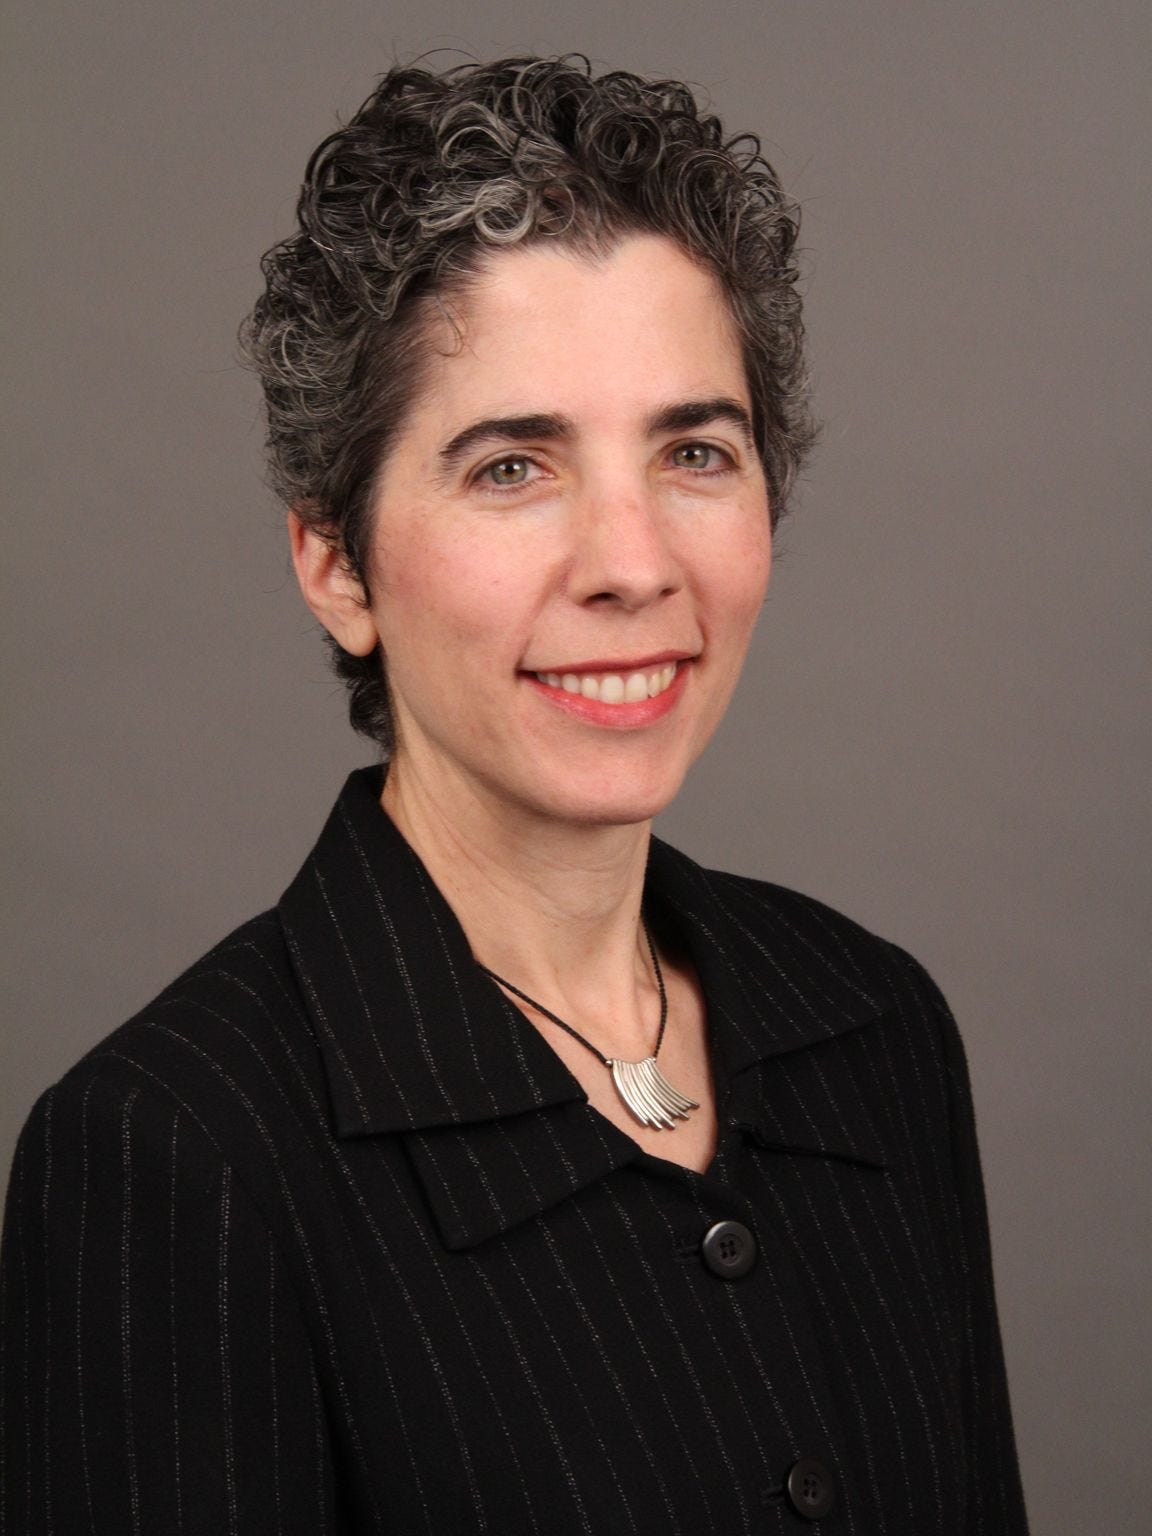 Hayley Gorenberg, deputy legal director for Lambda